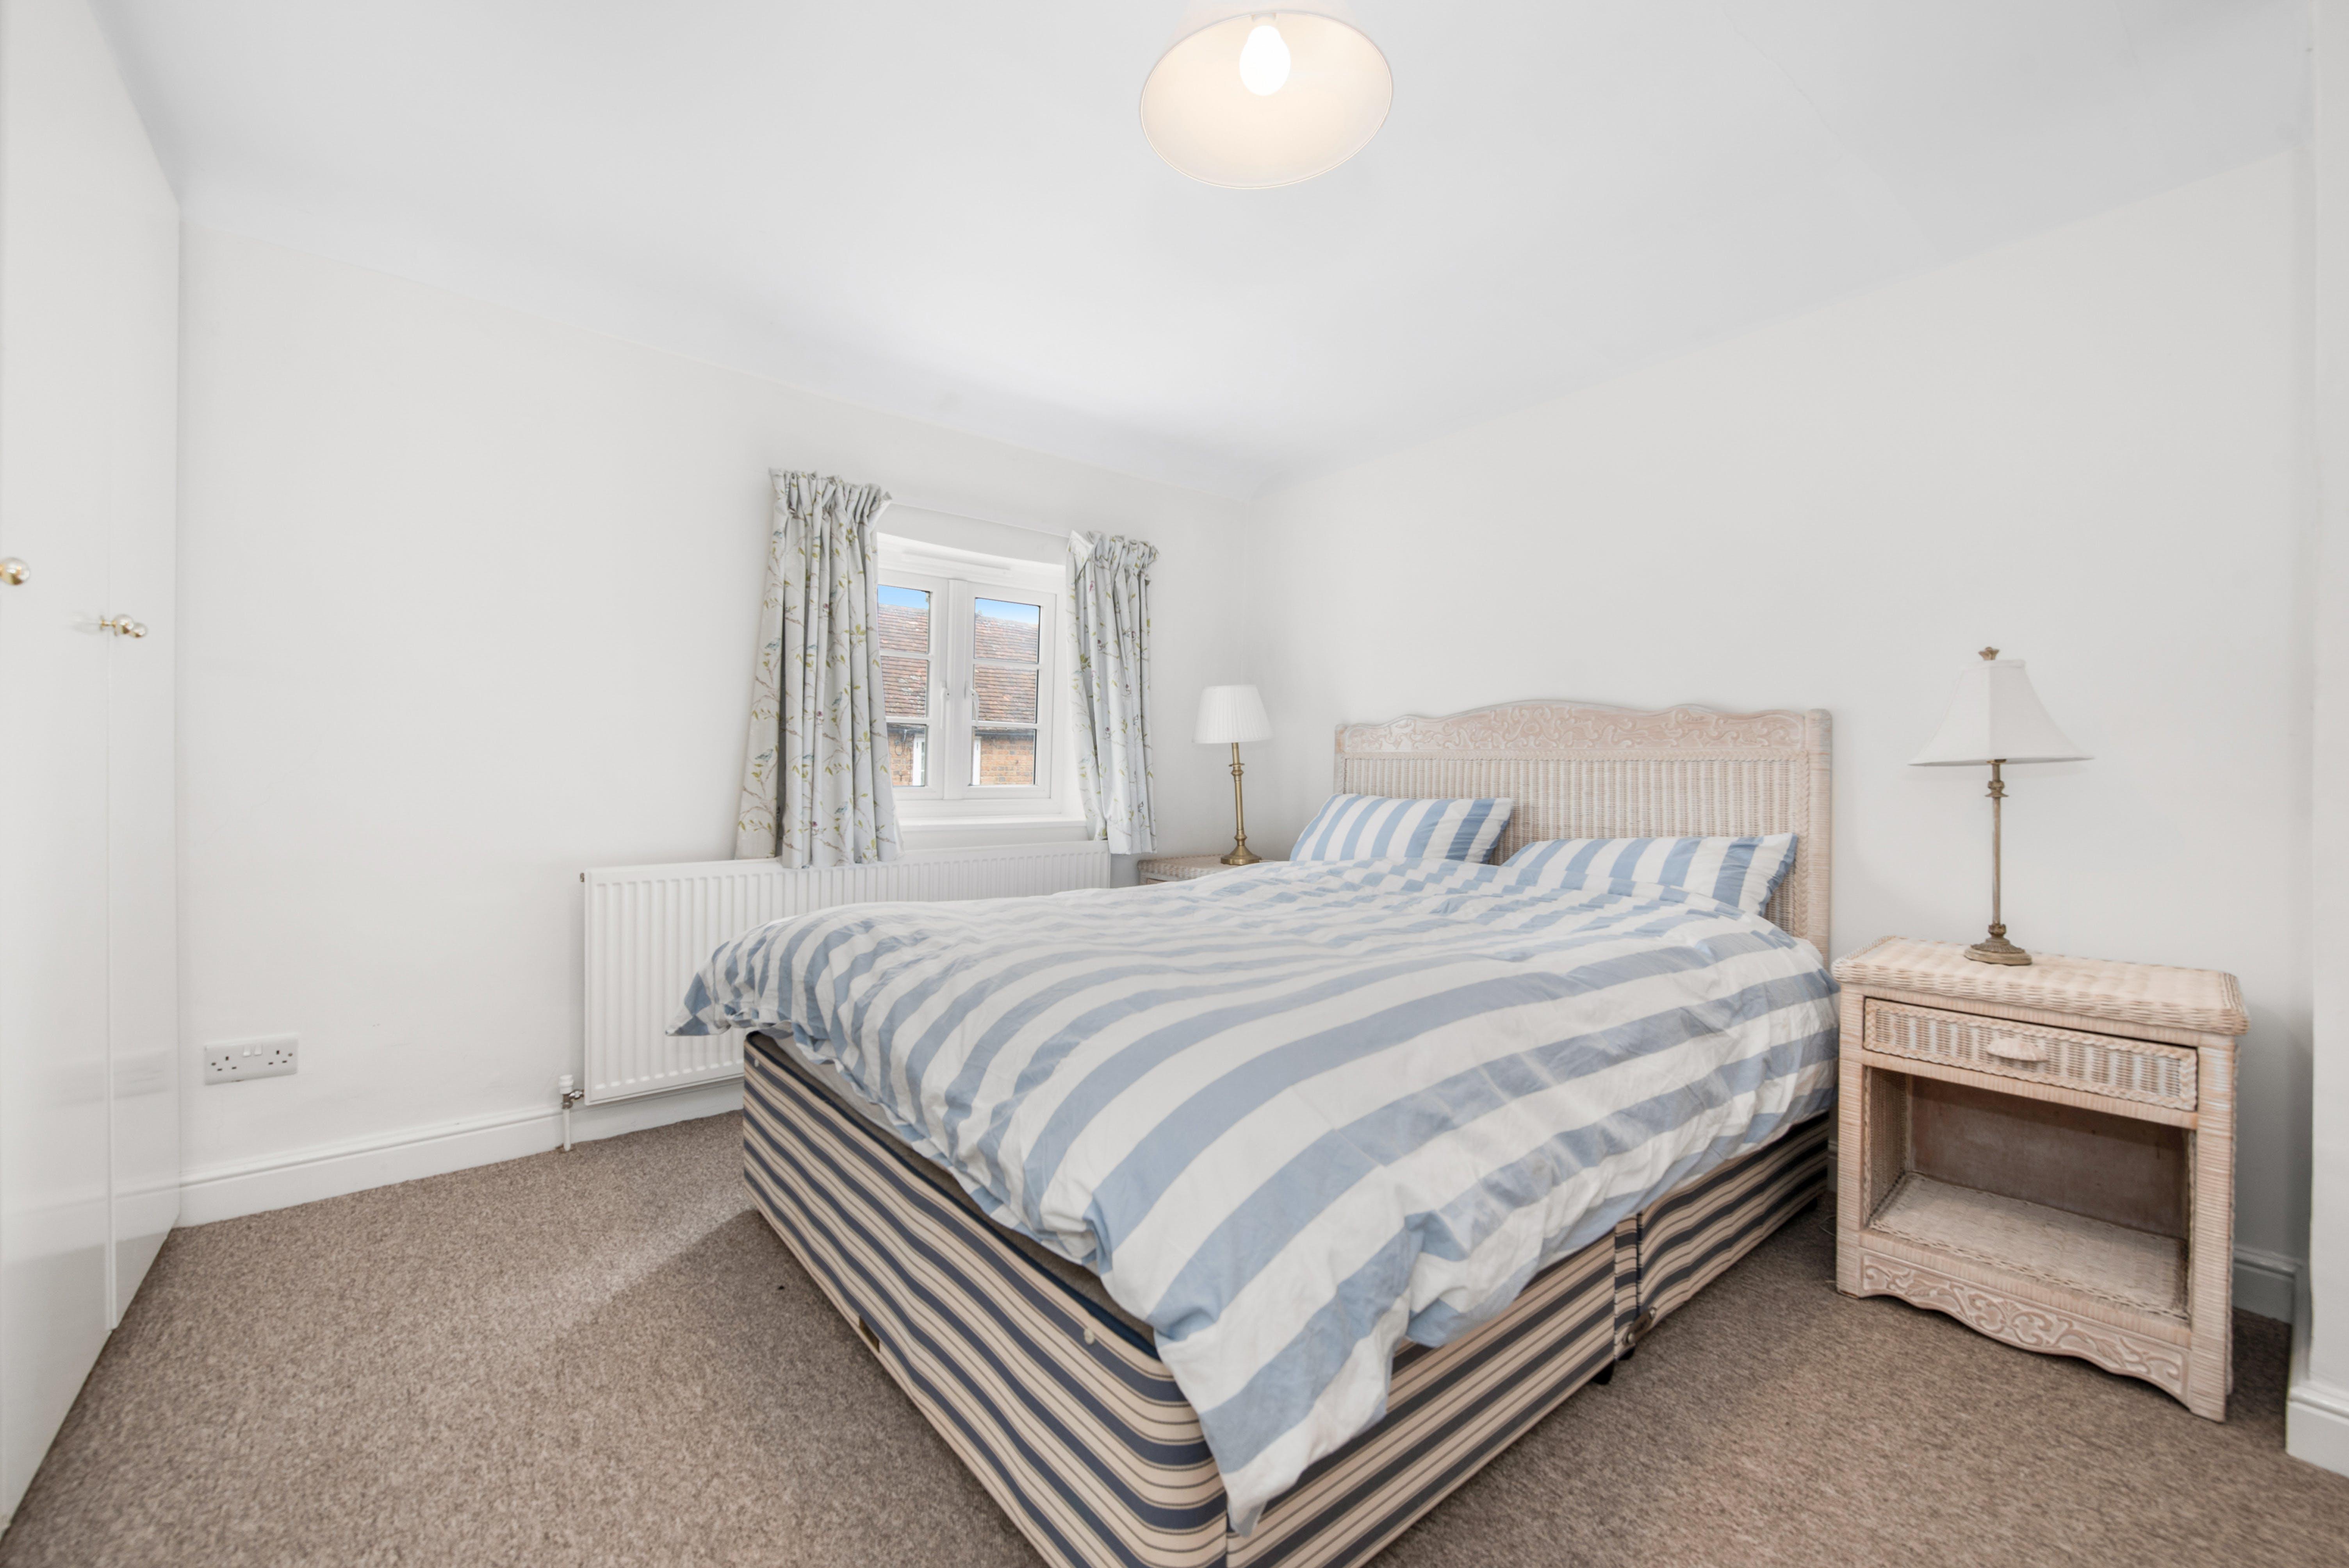 31 Windmill Street, Aylesbury, Residential For Sale - 31 Windmill Street11.jpg